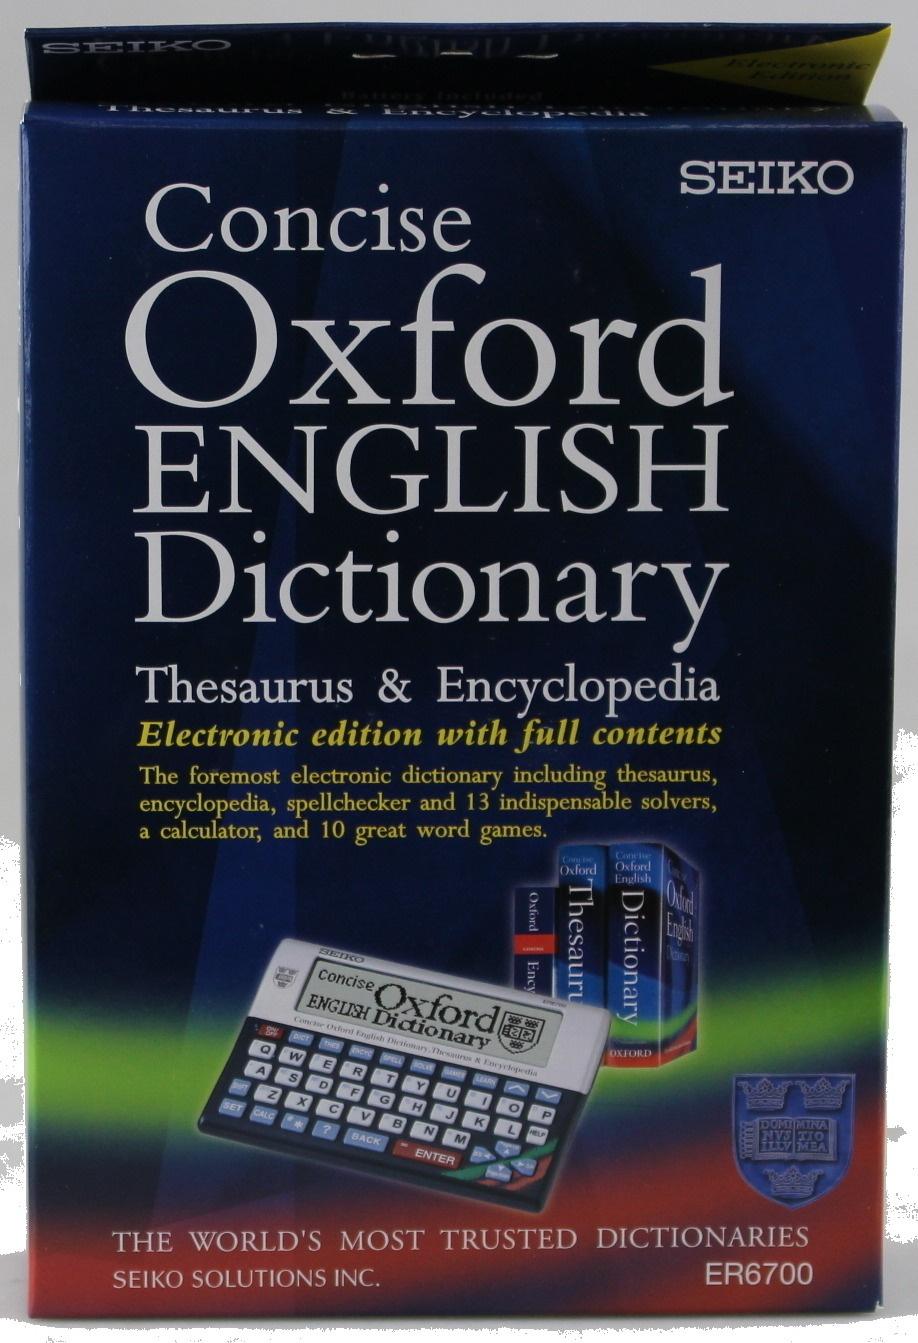 Seiko- Er6700 Concise Oxford Dictionary/ Thesaurus/ Encyclopaedia